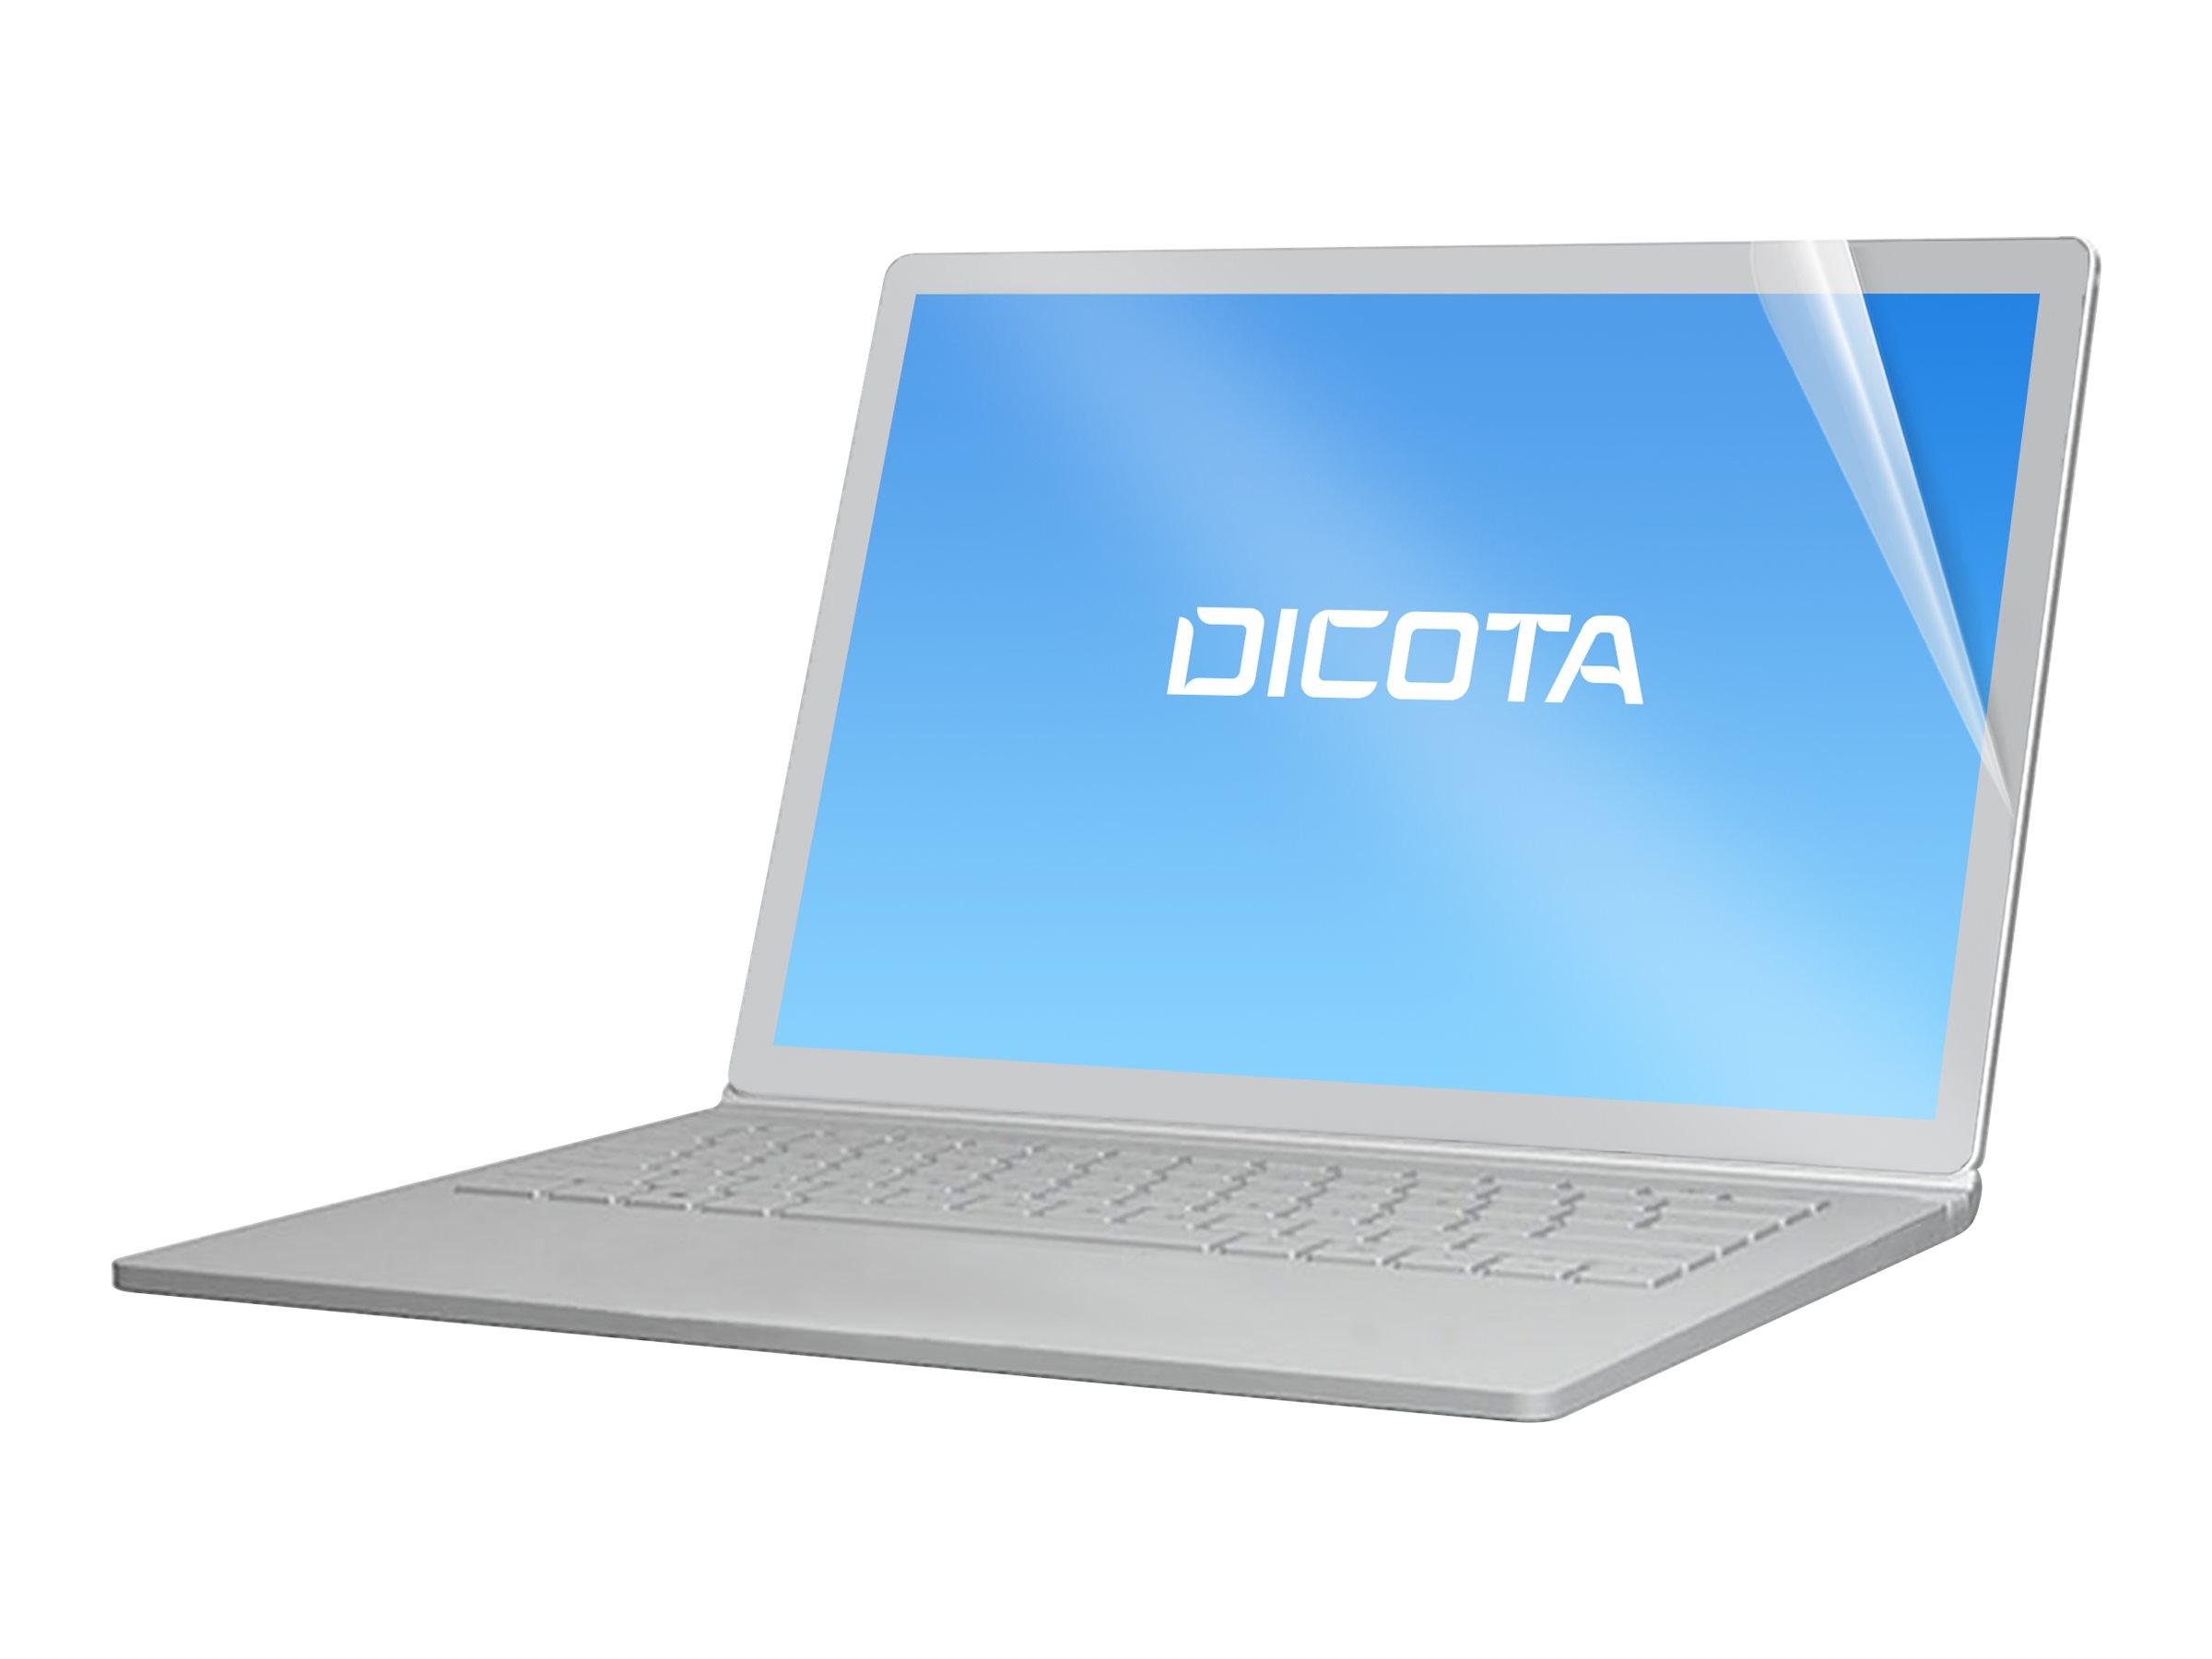 Vorschau: Dicota Anti-Glare Filter 9H - Blendfreier Notebook-Filter